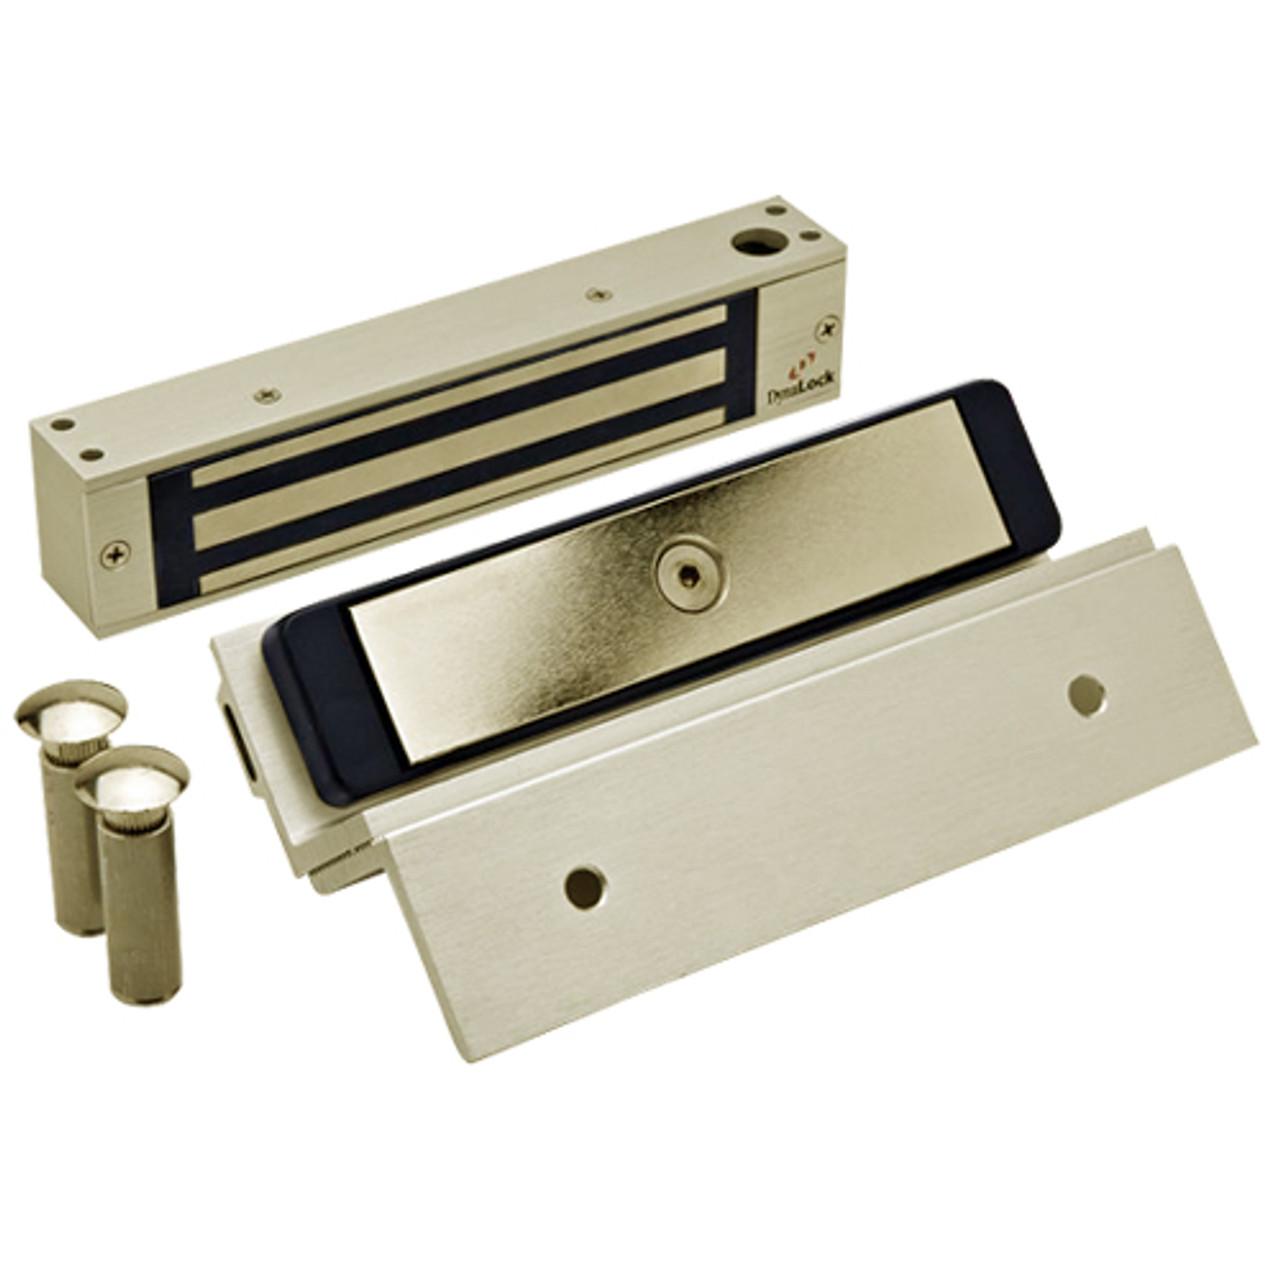 2585-TJ85-US4 DynaLock 2500 Series 650 LB Single Bantam Mini Electromagnetic Lock for Inswing Door in Satin Brass